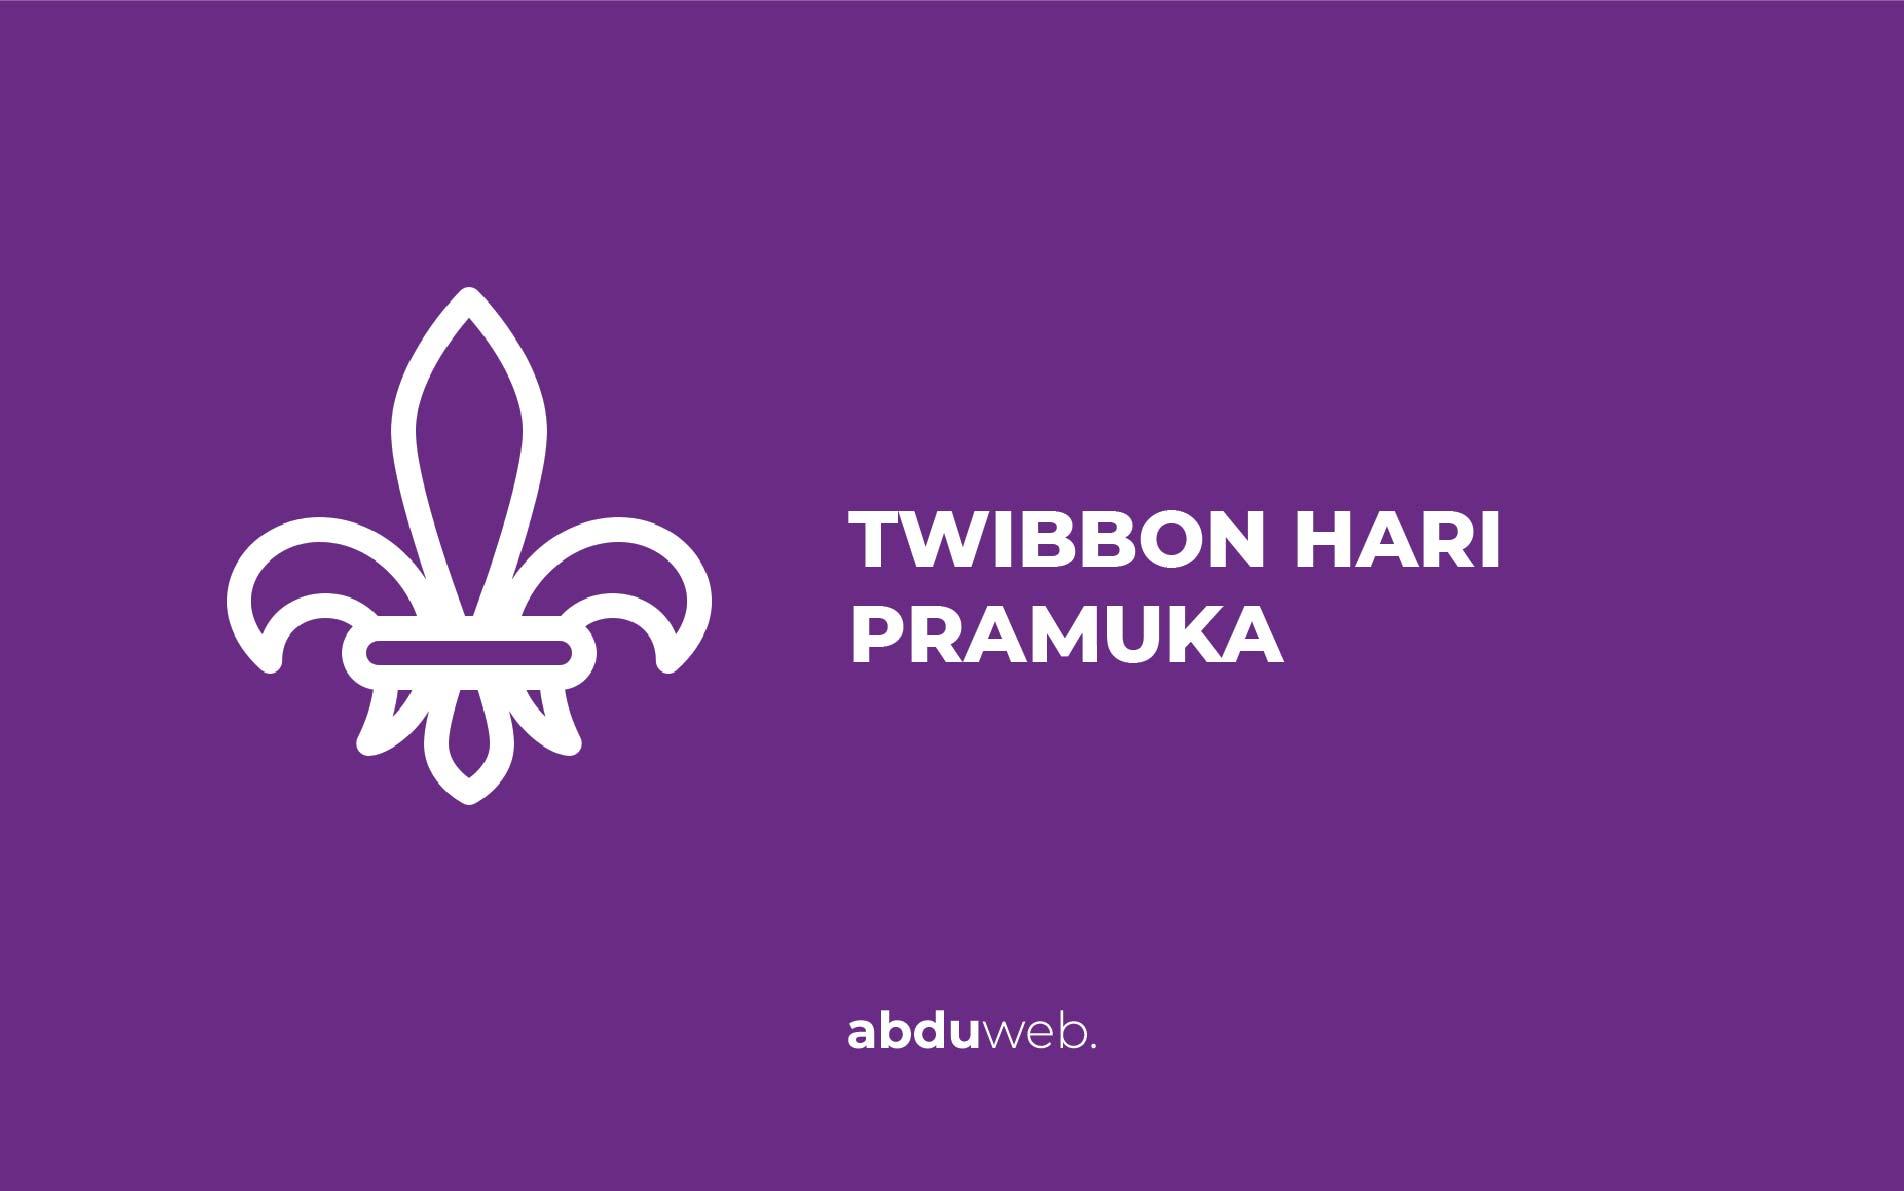 20+ Kumpulan Link Twibbon Hari Pramuka Ke 20 tahun 20, Terkeren